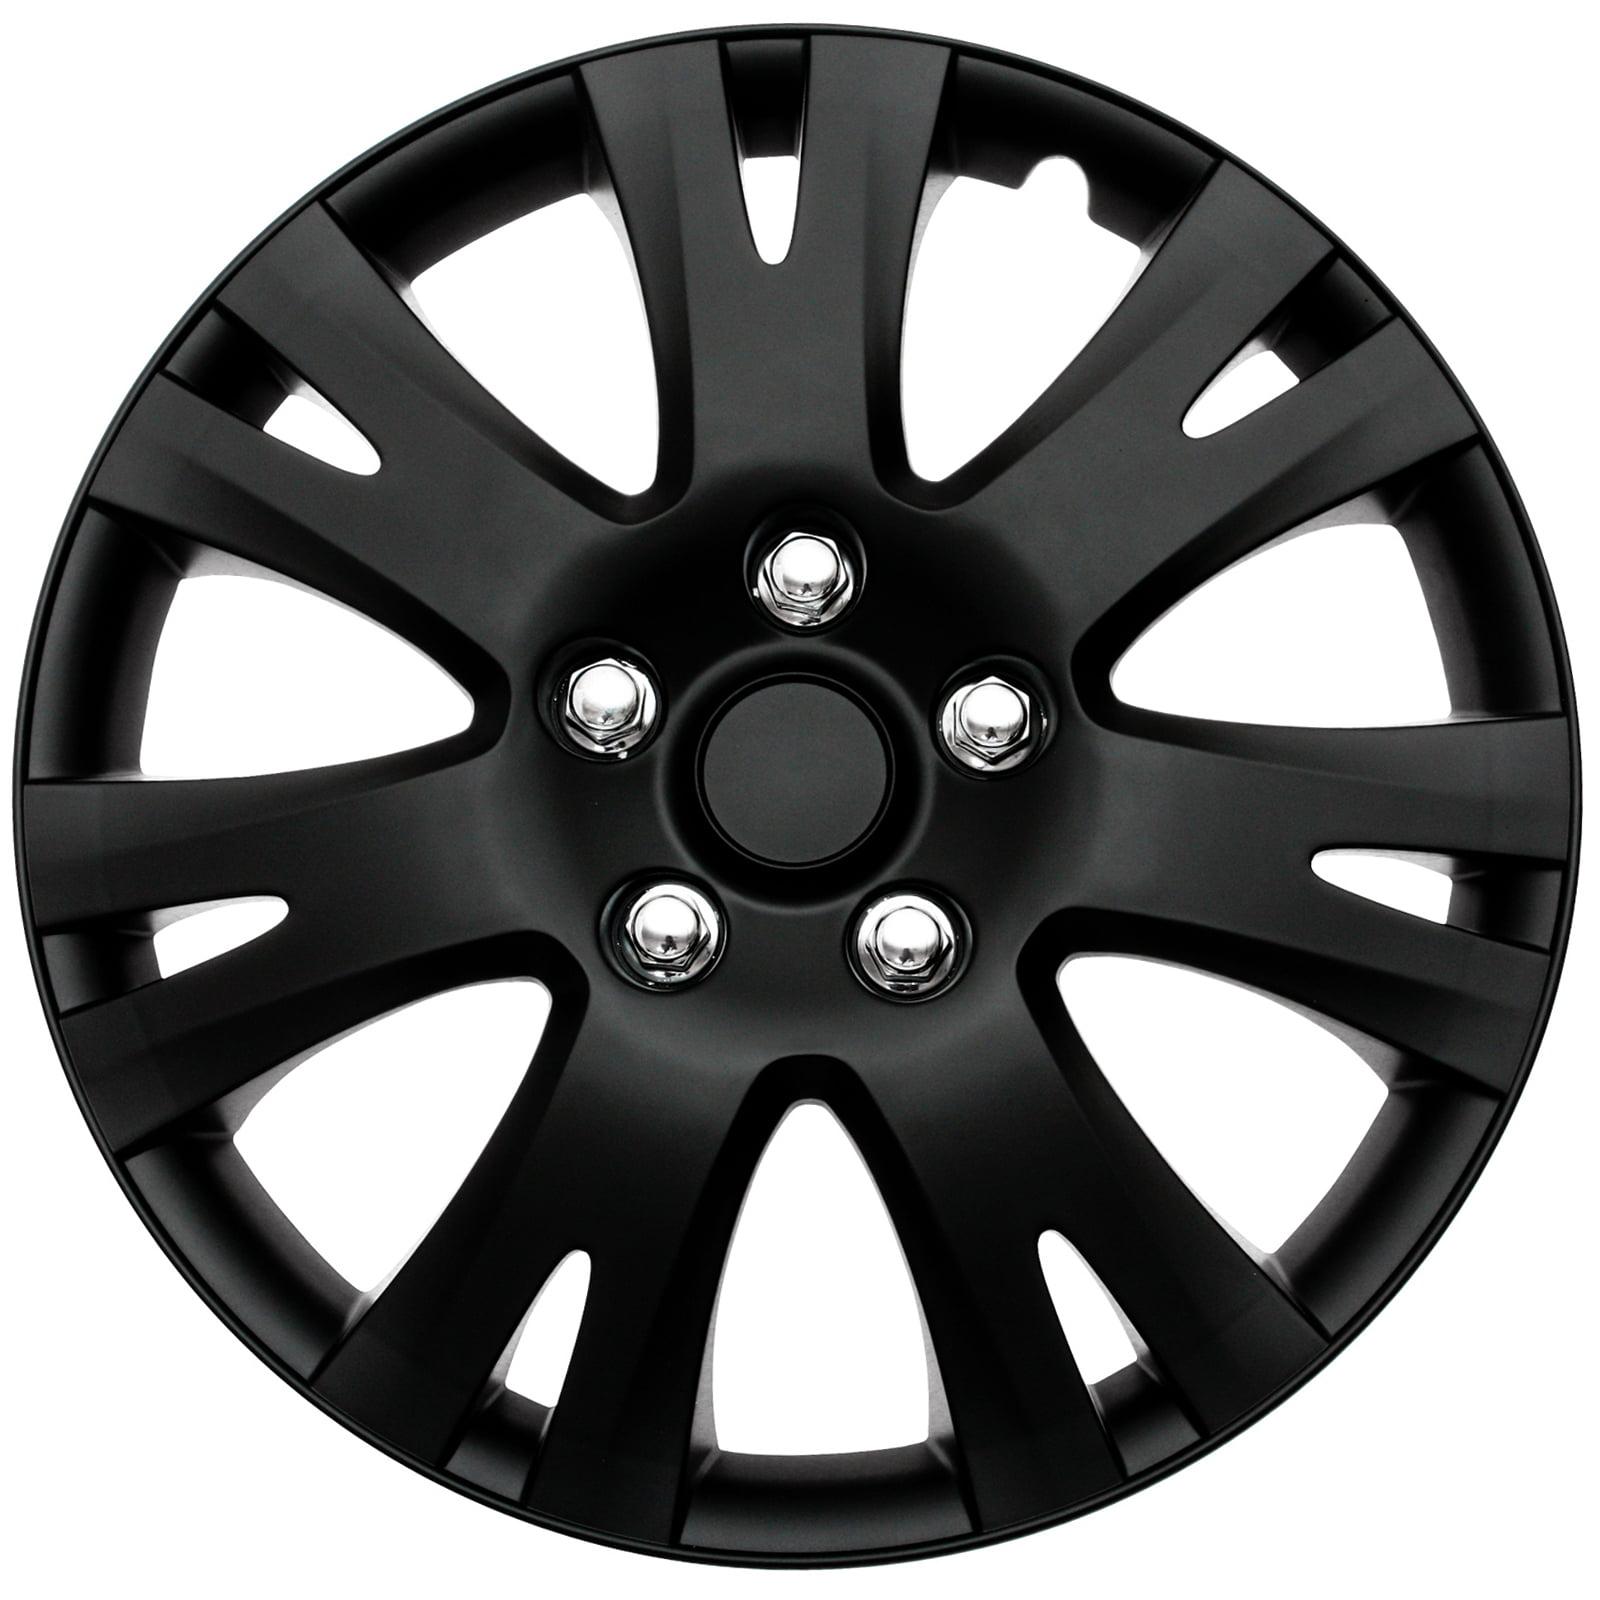 4 Pc Set Hub Cap Abs Black Matte 16 Inch For Oem Steel Wheel Cover